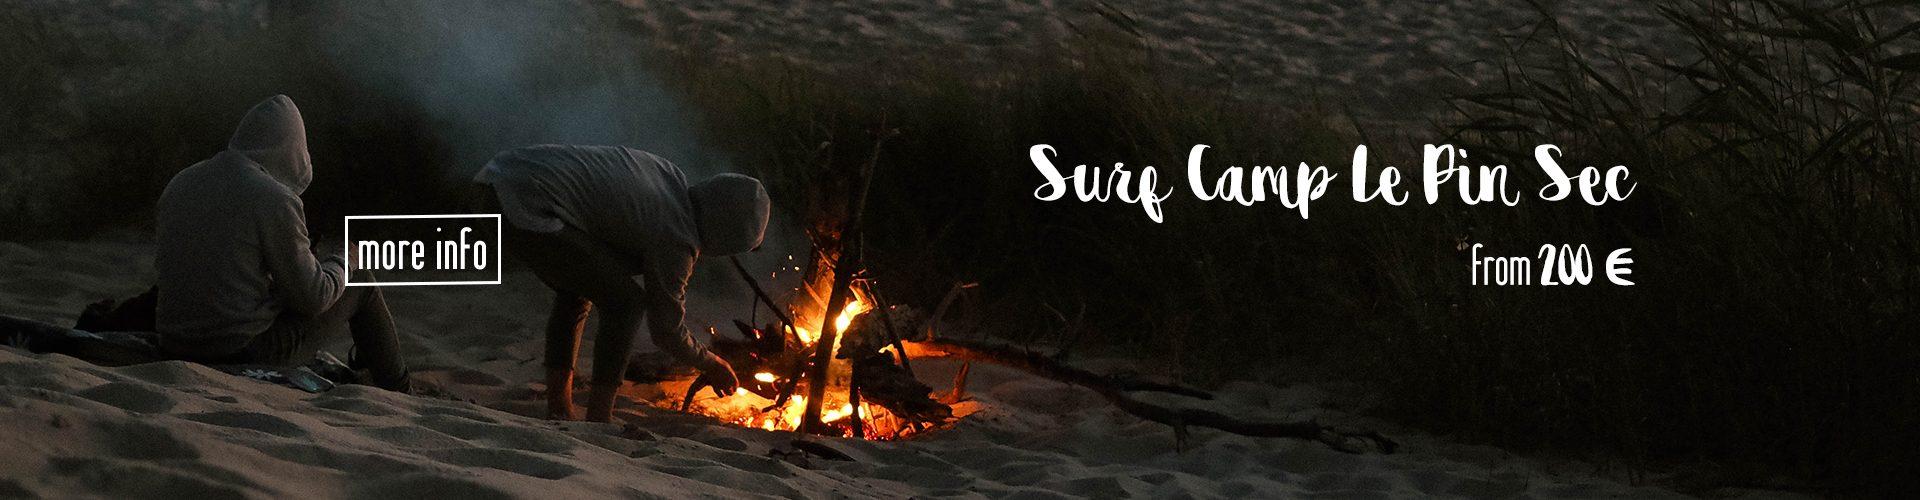 Surf Camp Le Pin Sec